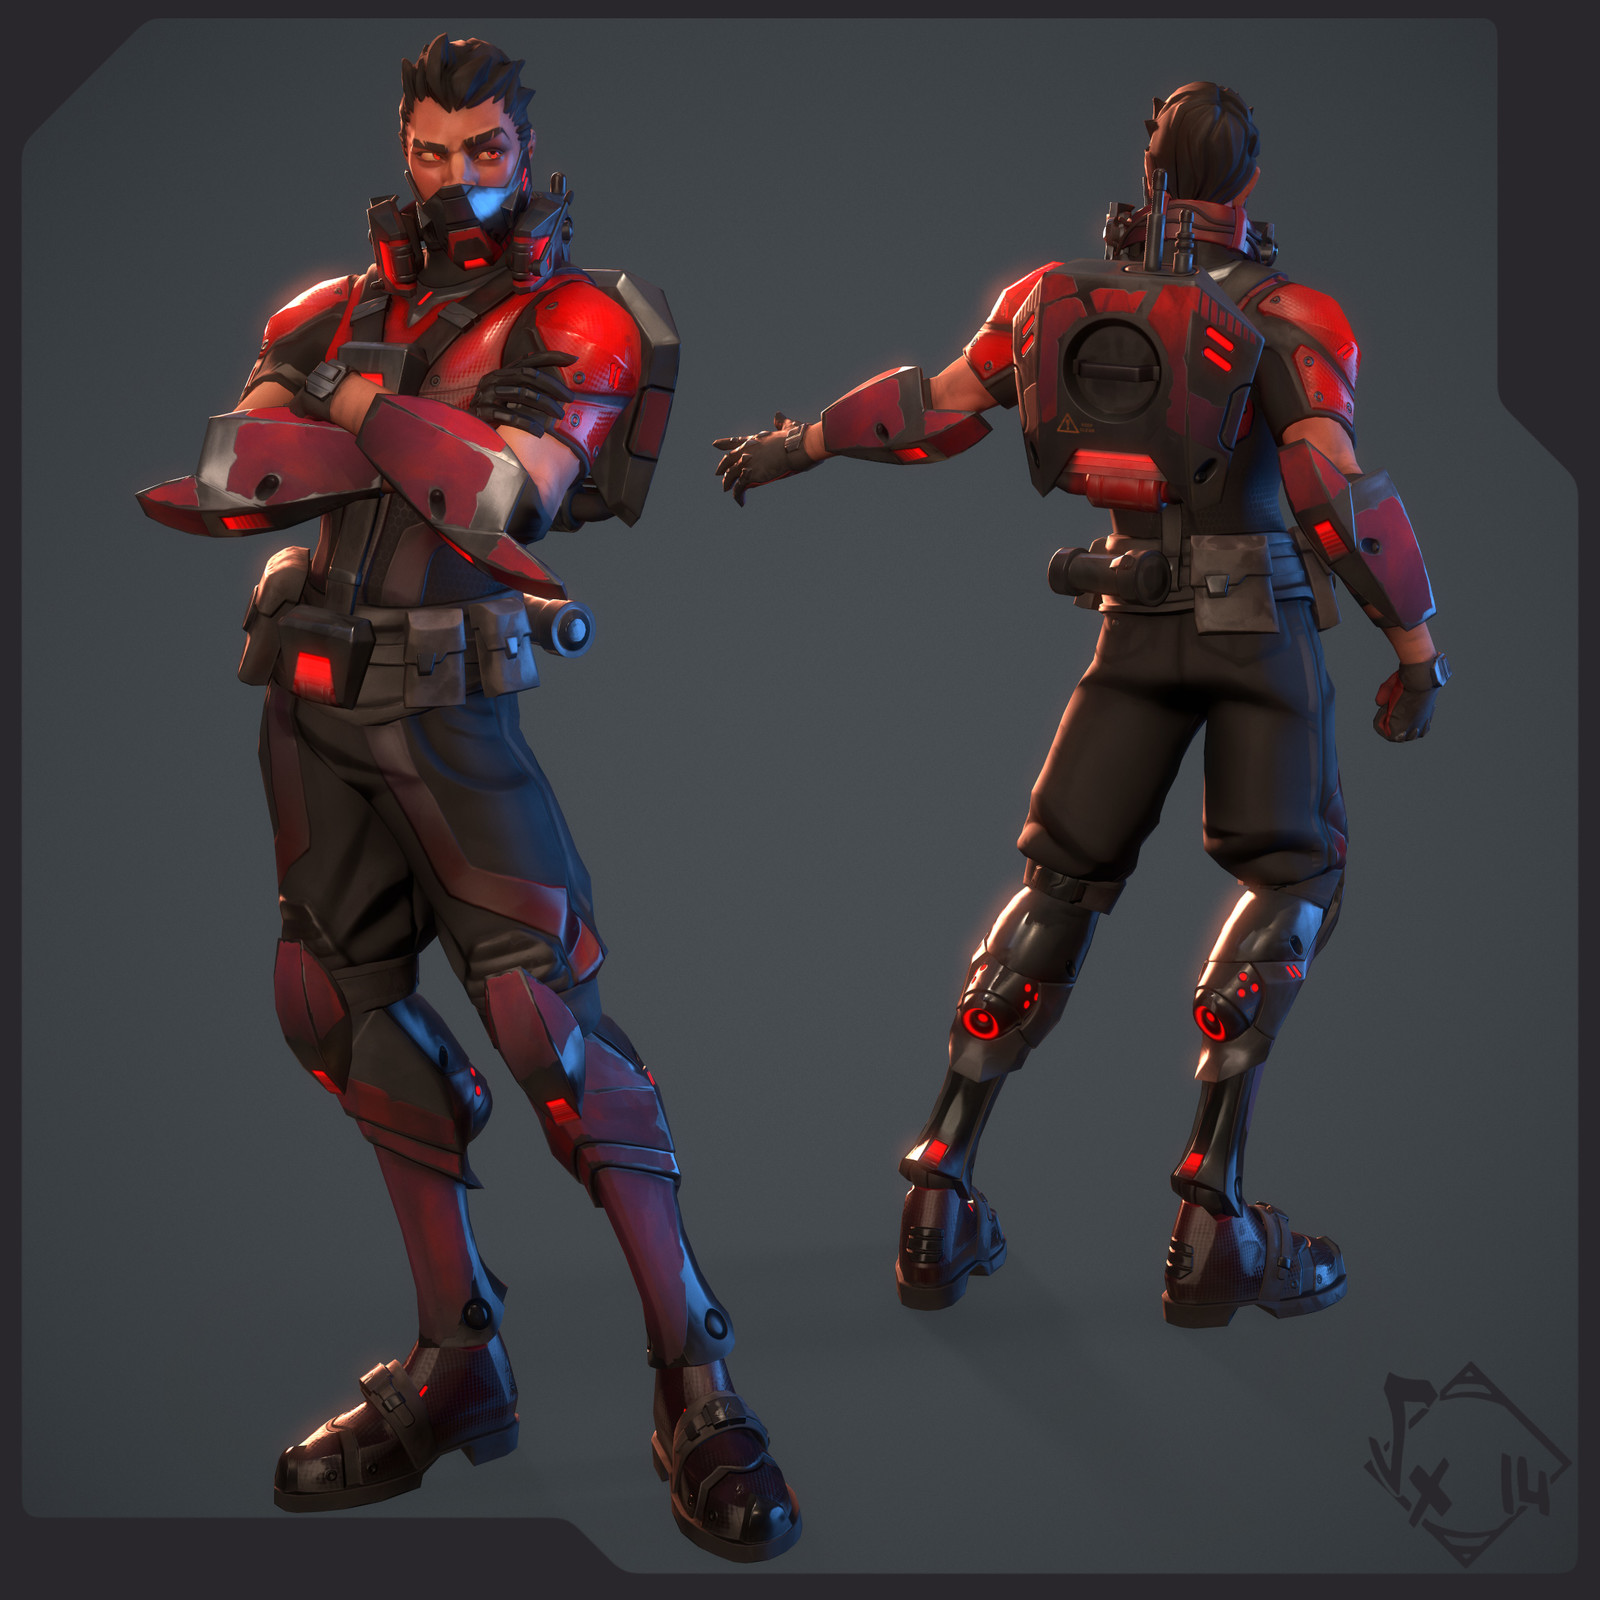 Syblast - GroundBreaker Skin